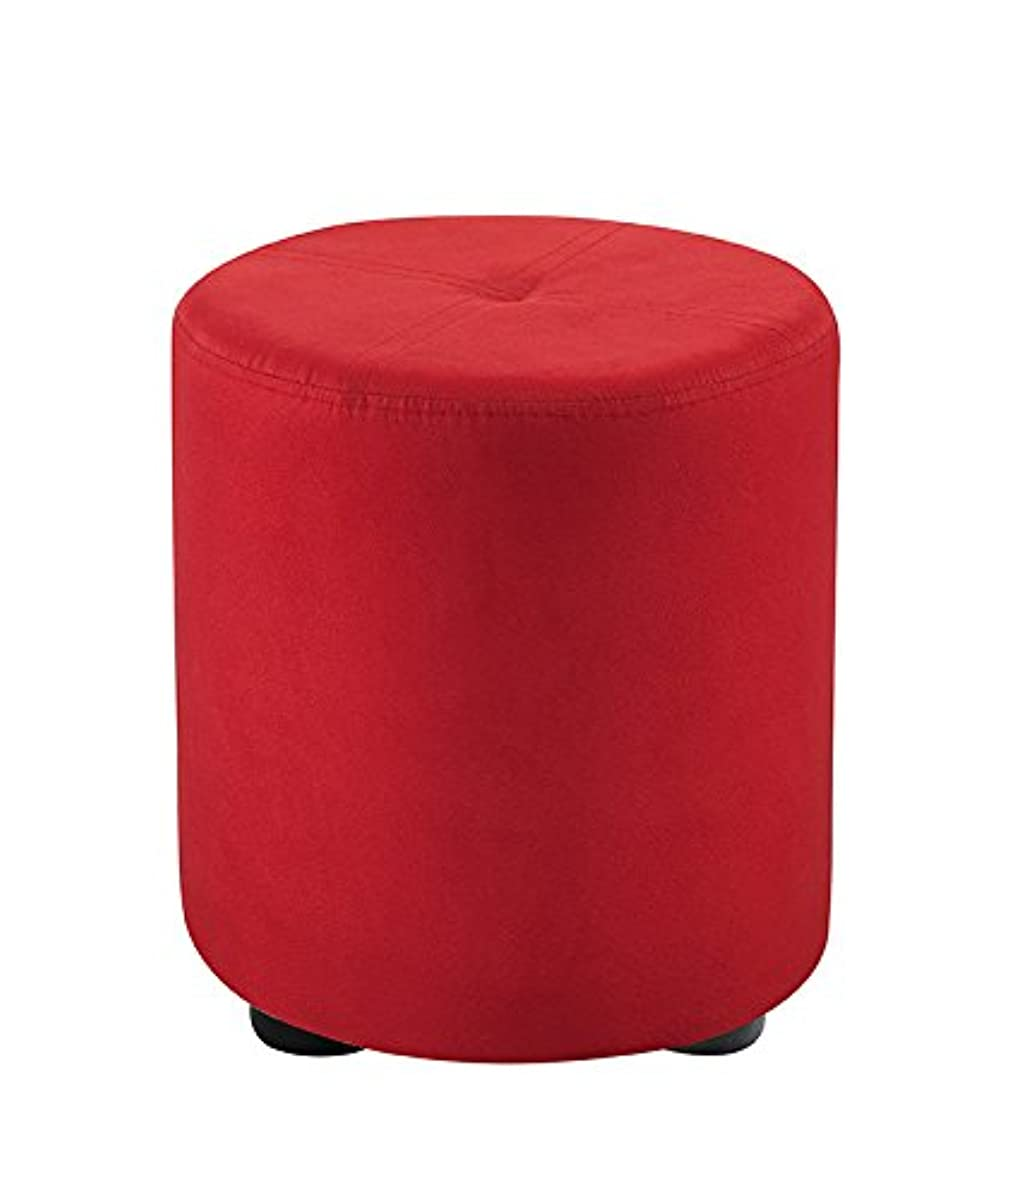 Kings Brand Furniture Round Ottoman Stool (Red Microfiber)